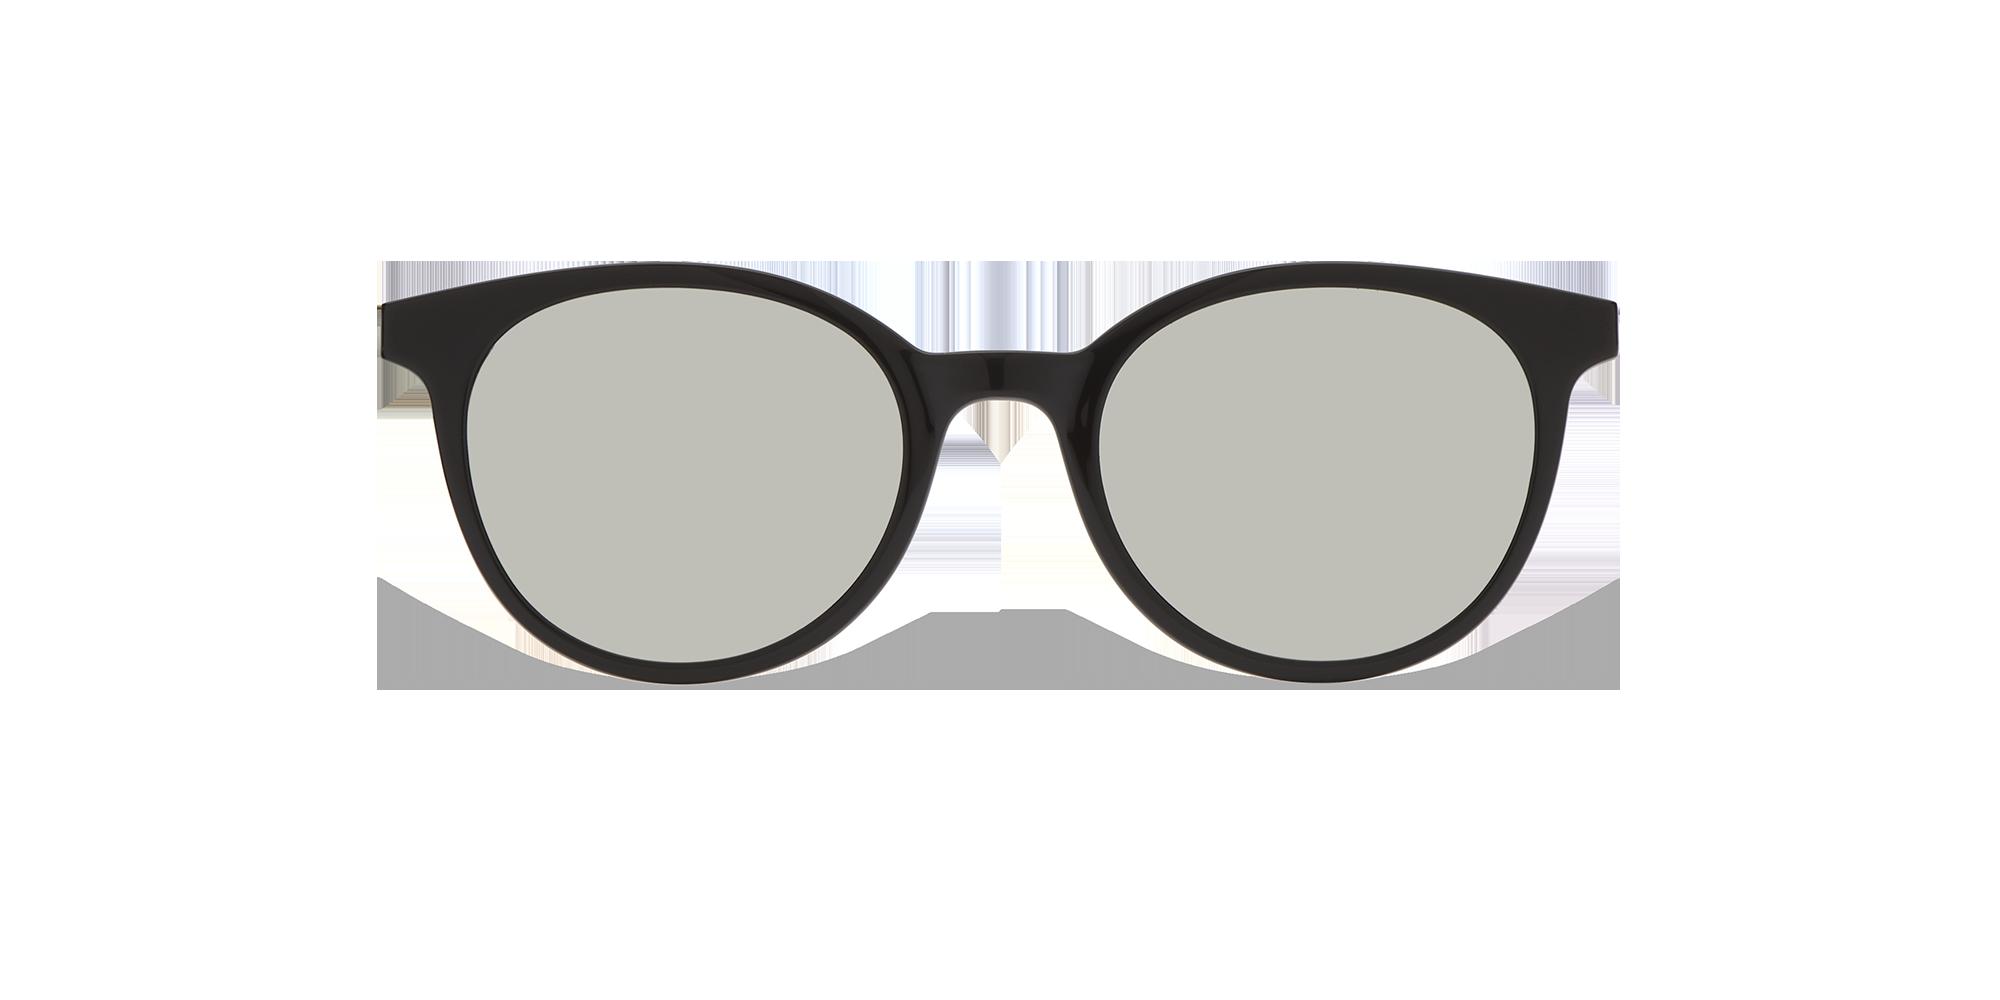 afflelou/france/products/smart_clip/clips_glasses/TMK36R3BR014819.png